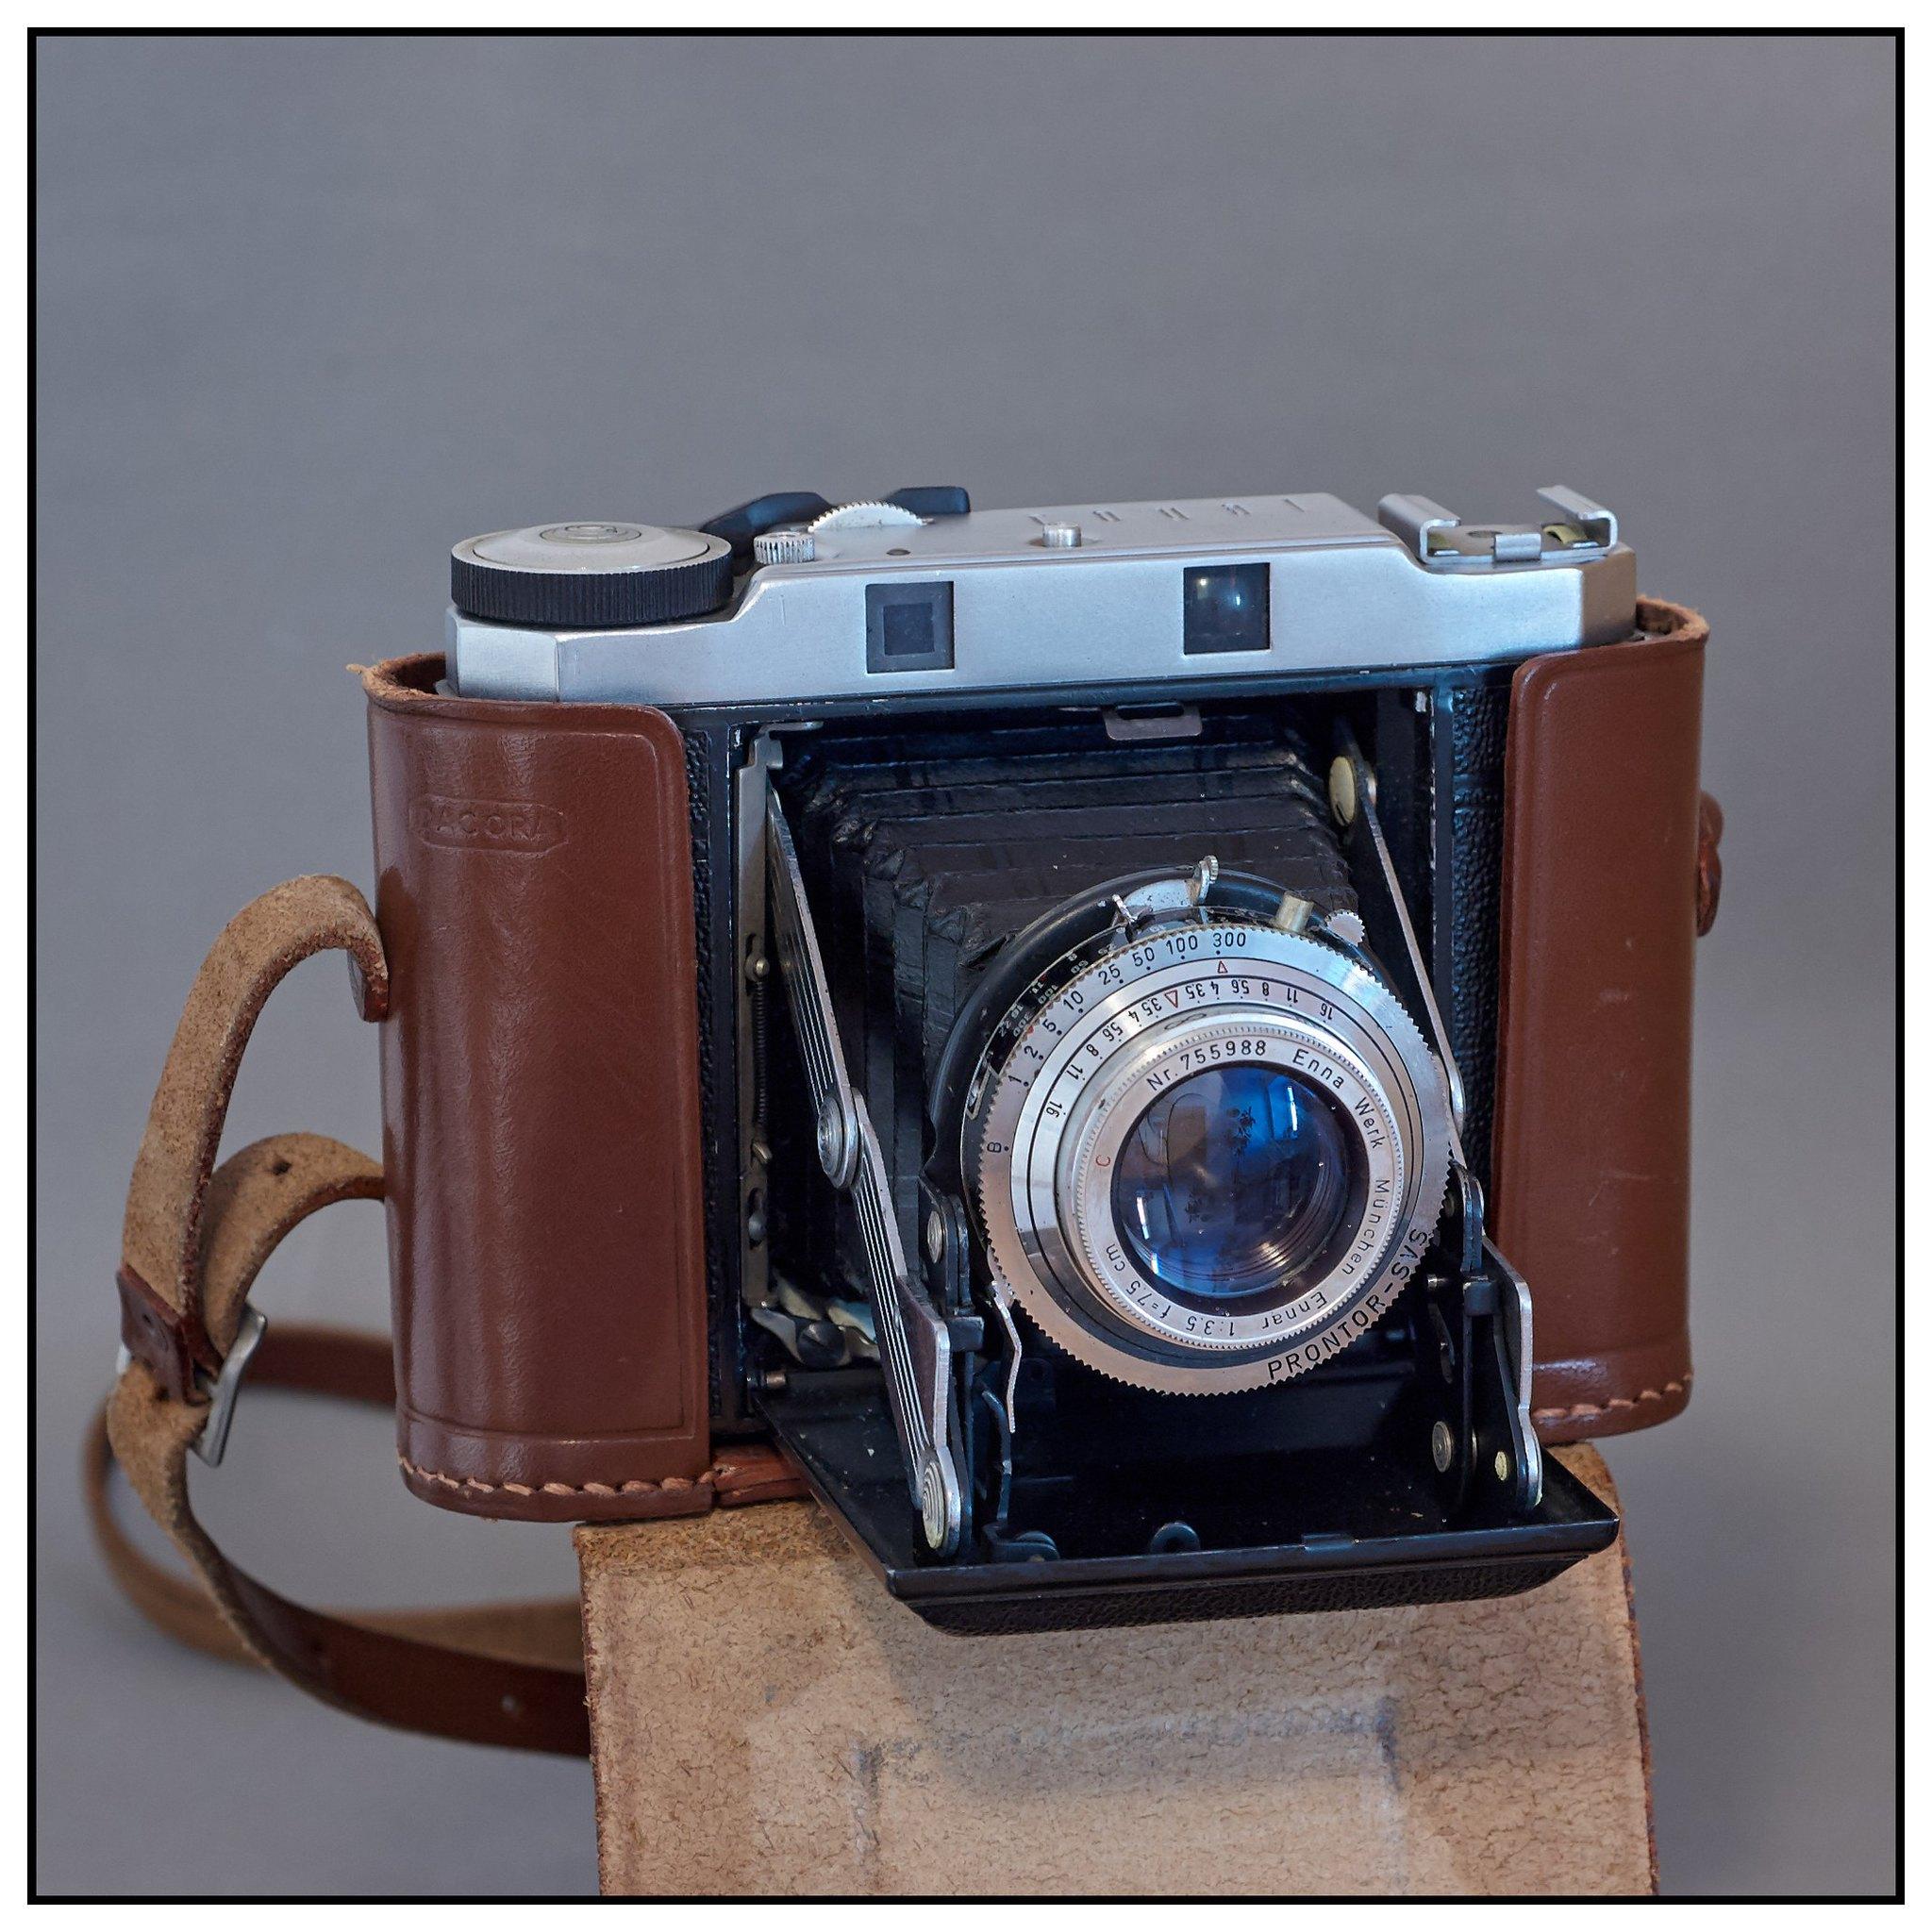 Dacora Royal confusion | The Camera Collector